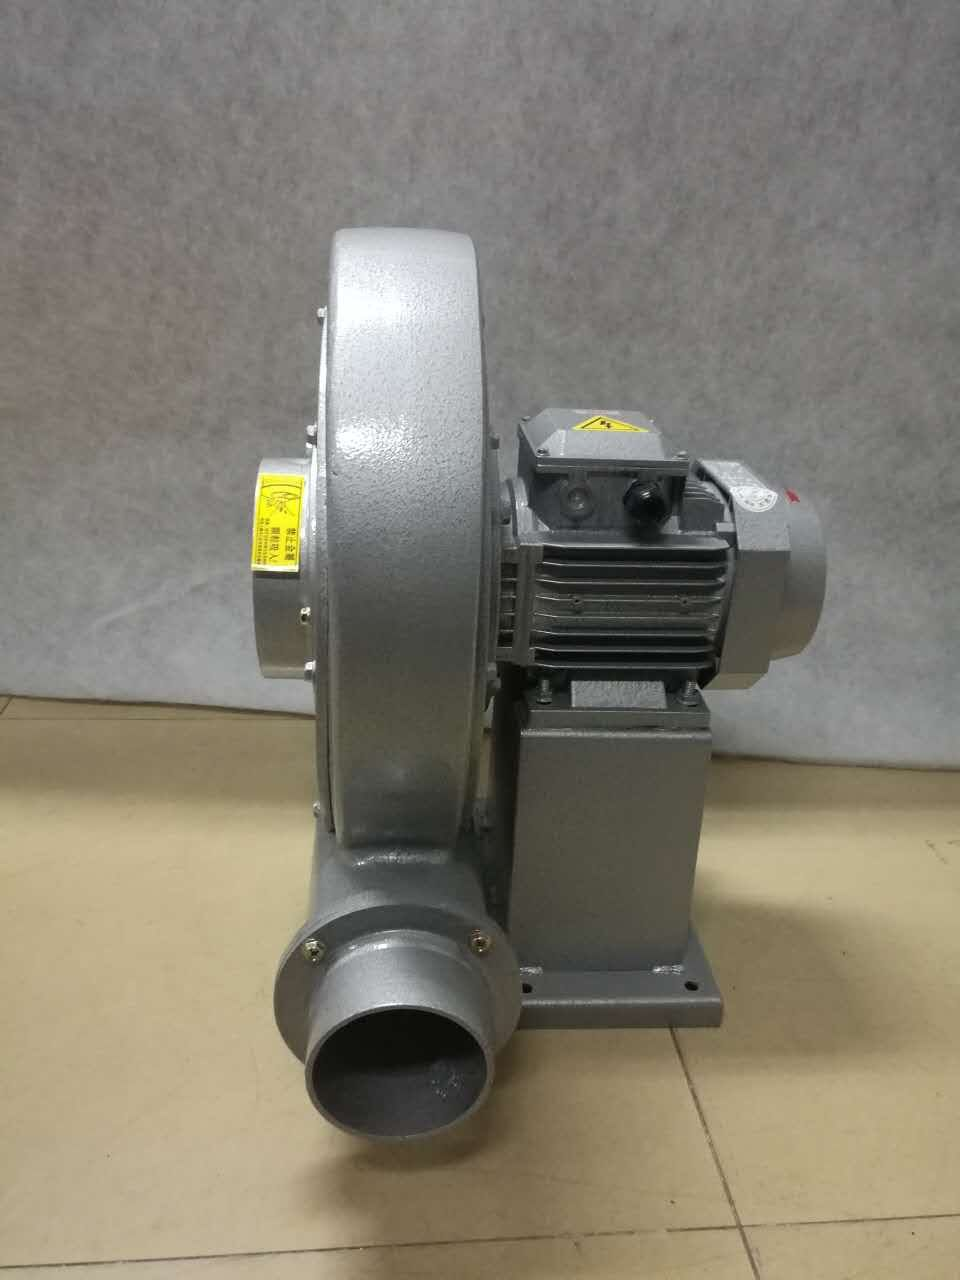 LK-802